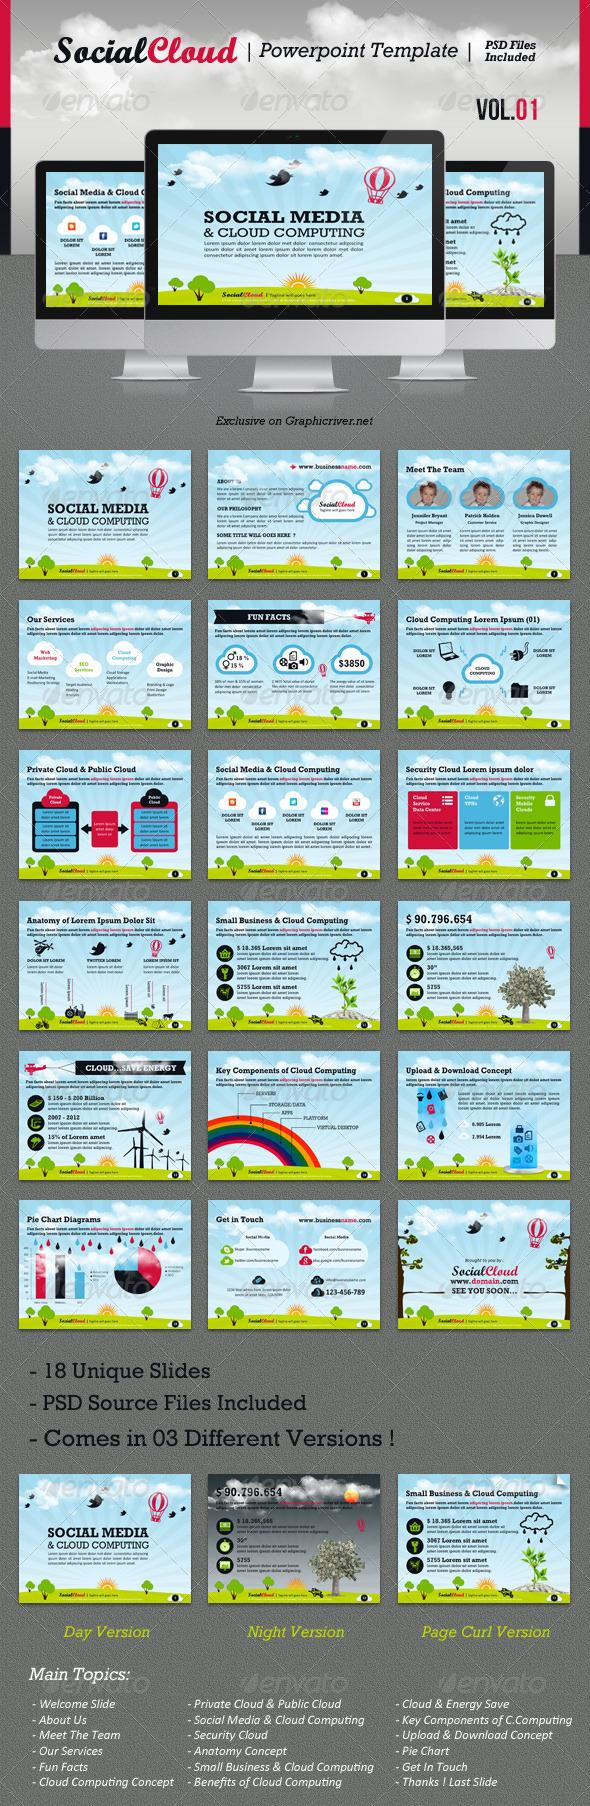 GraphicRiver SocialCloud Powerpoint Template V.01 2014331